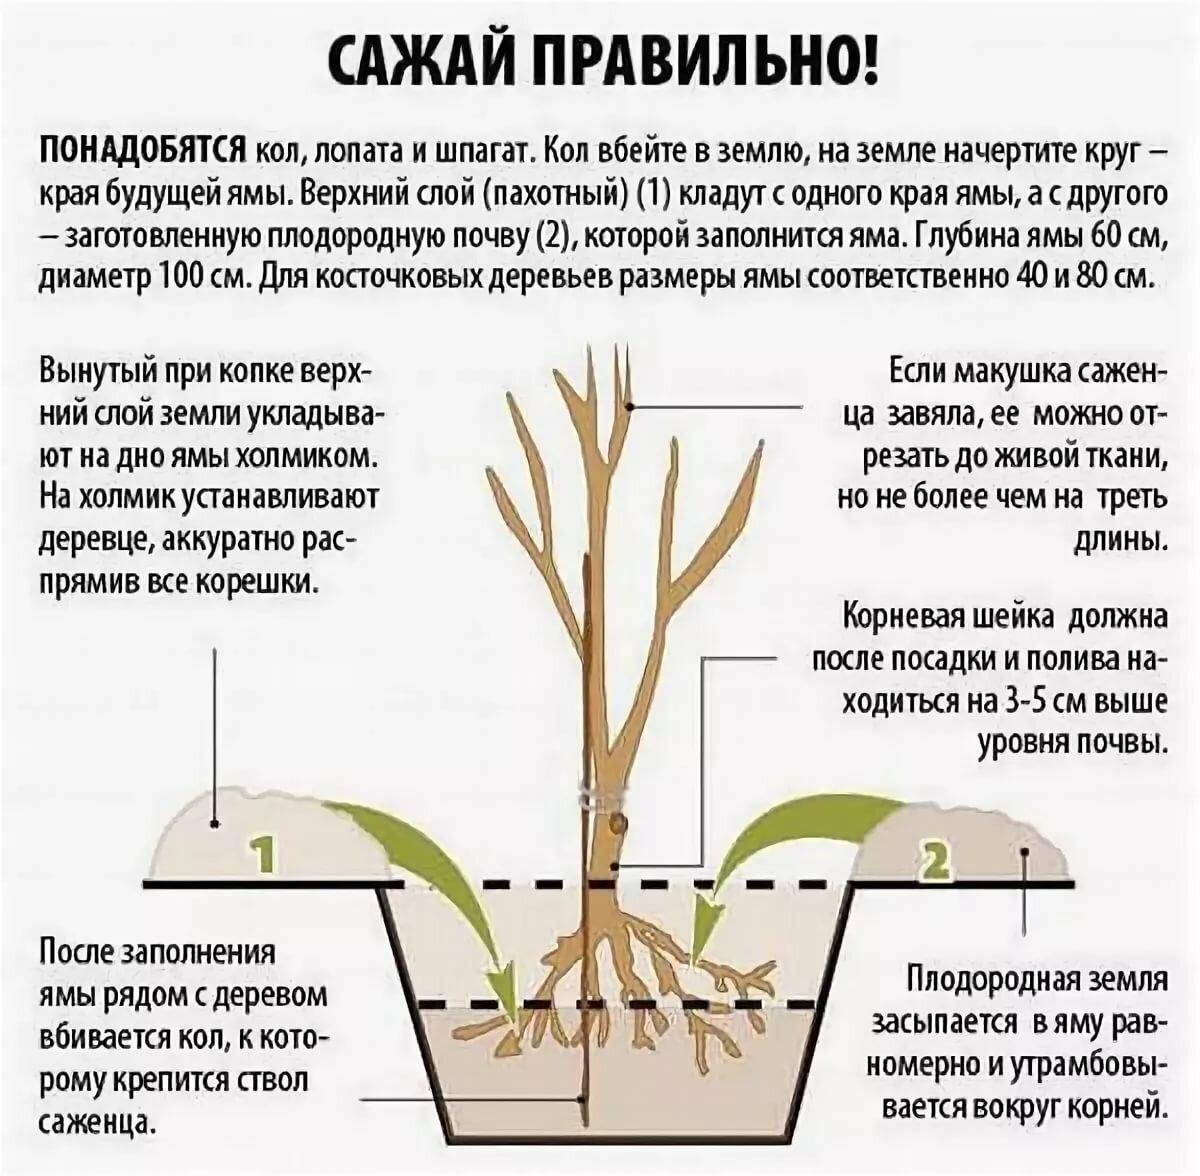 Цветок лиатрис: посадка и уход в открытом грунте, фото, выращивание из семян